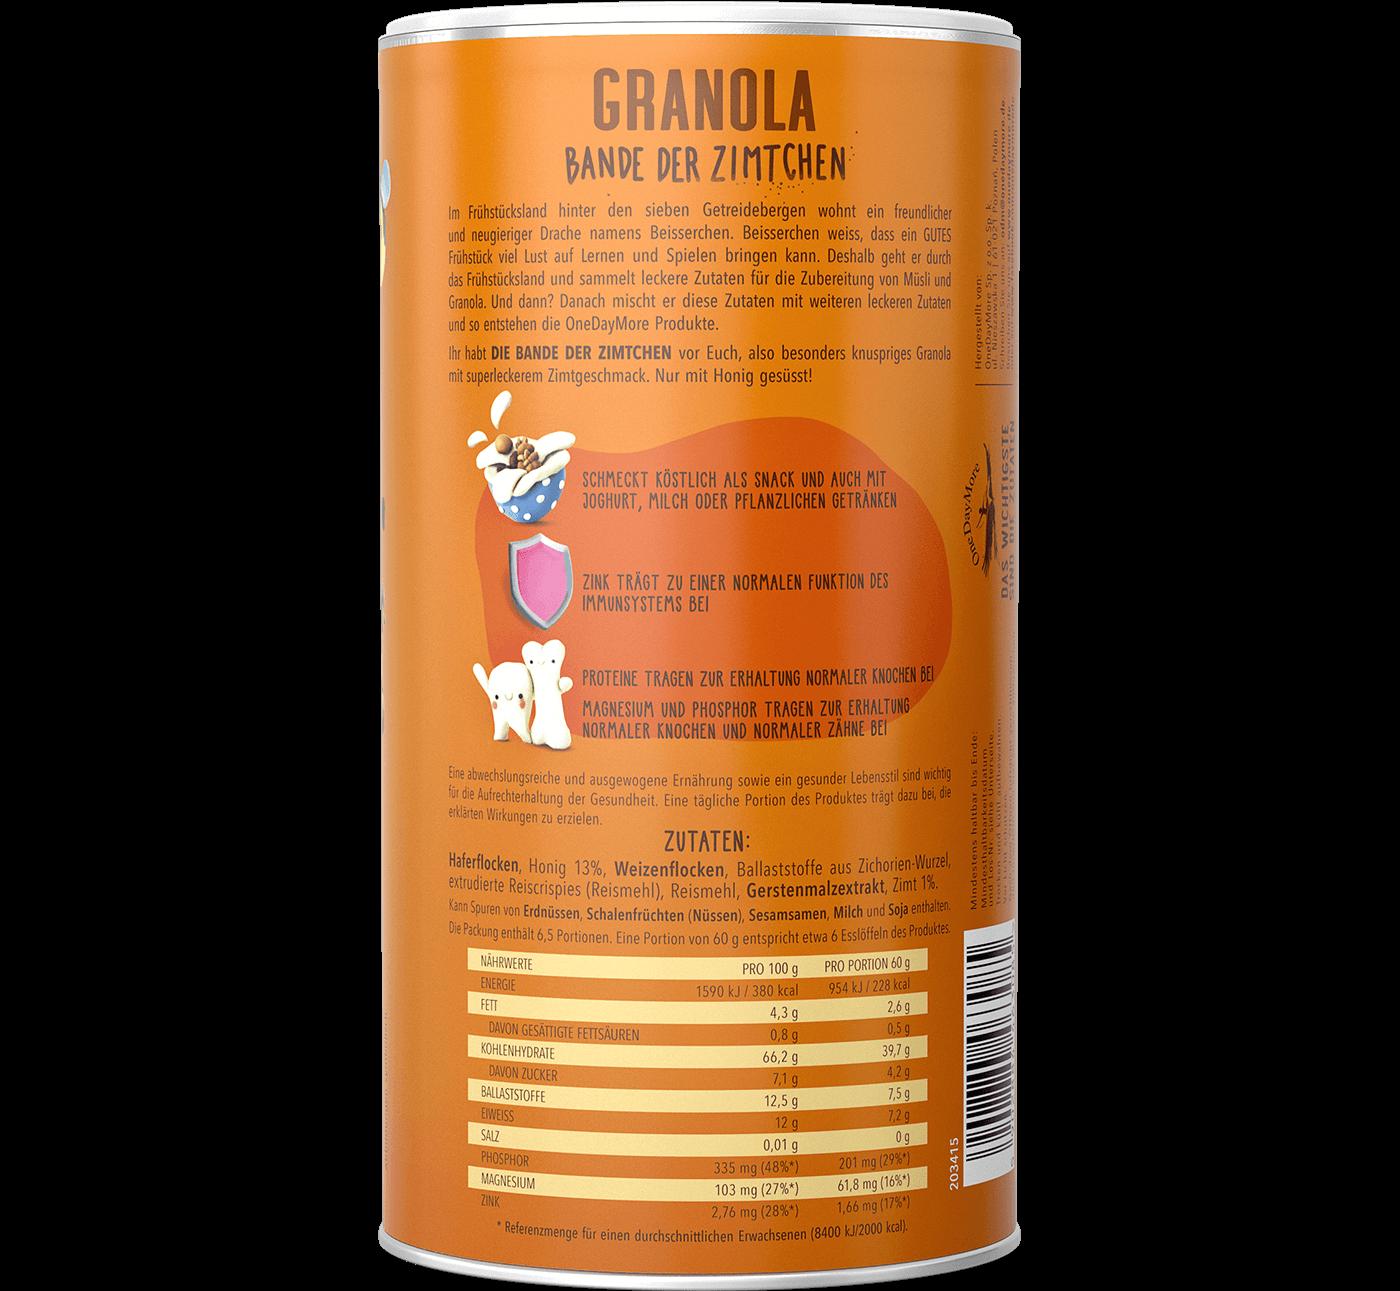 granola-bande-der-zimtchen-onedaymore-tyl-tuba-1400×1291